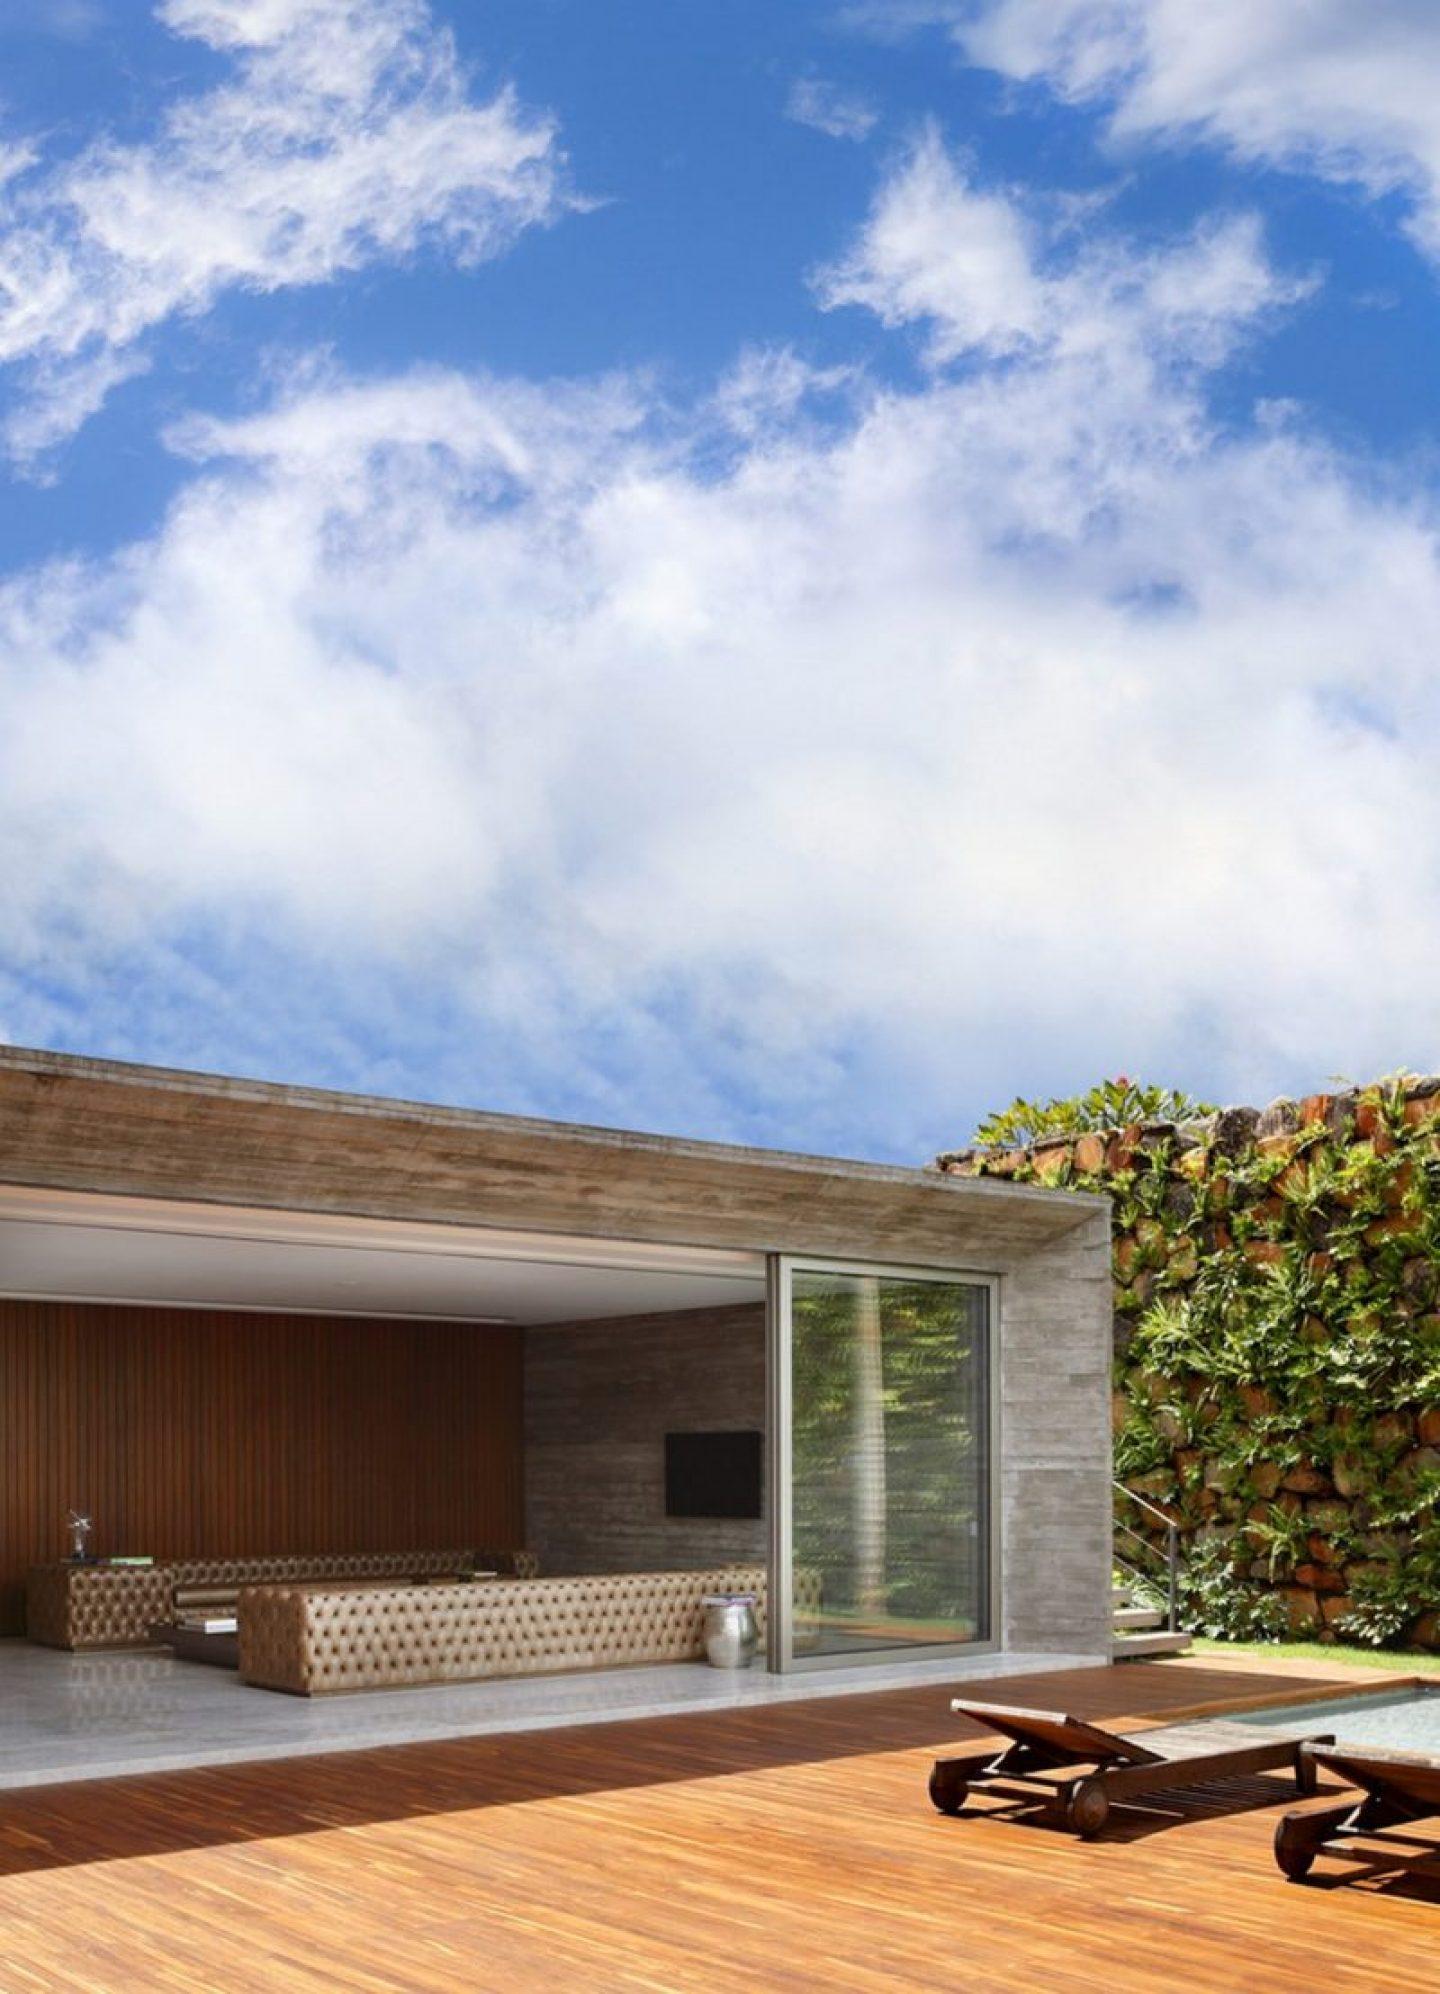 Guilherme_Torres_Architecture (6)